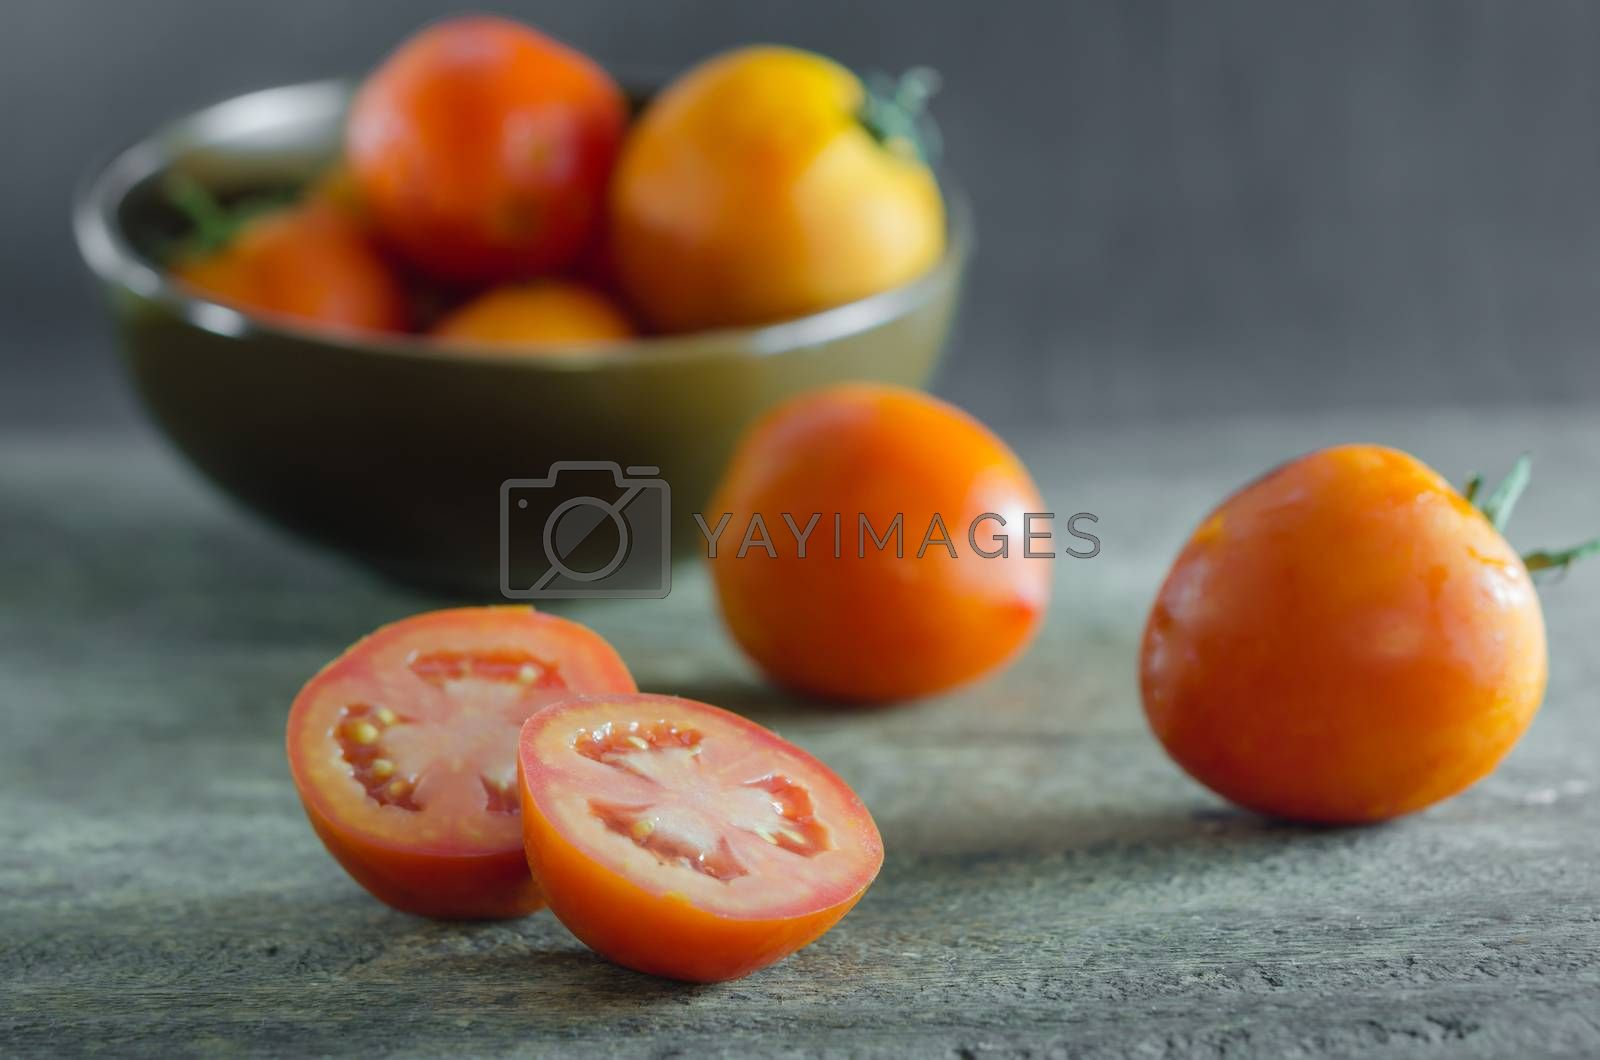 Royalty free image of  tomatoes by rakratchada